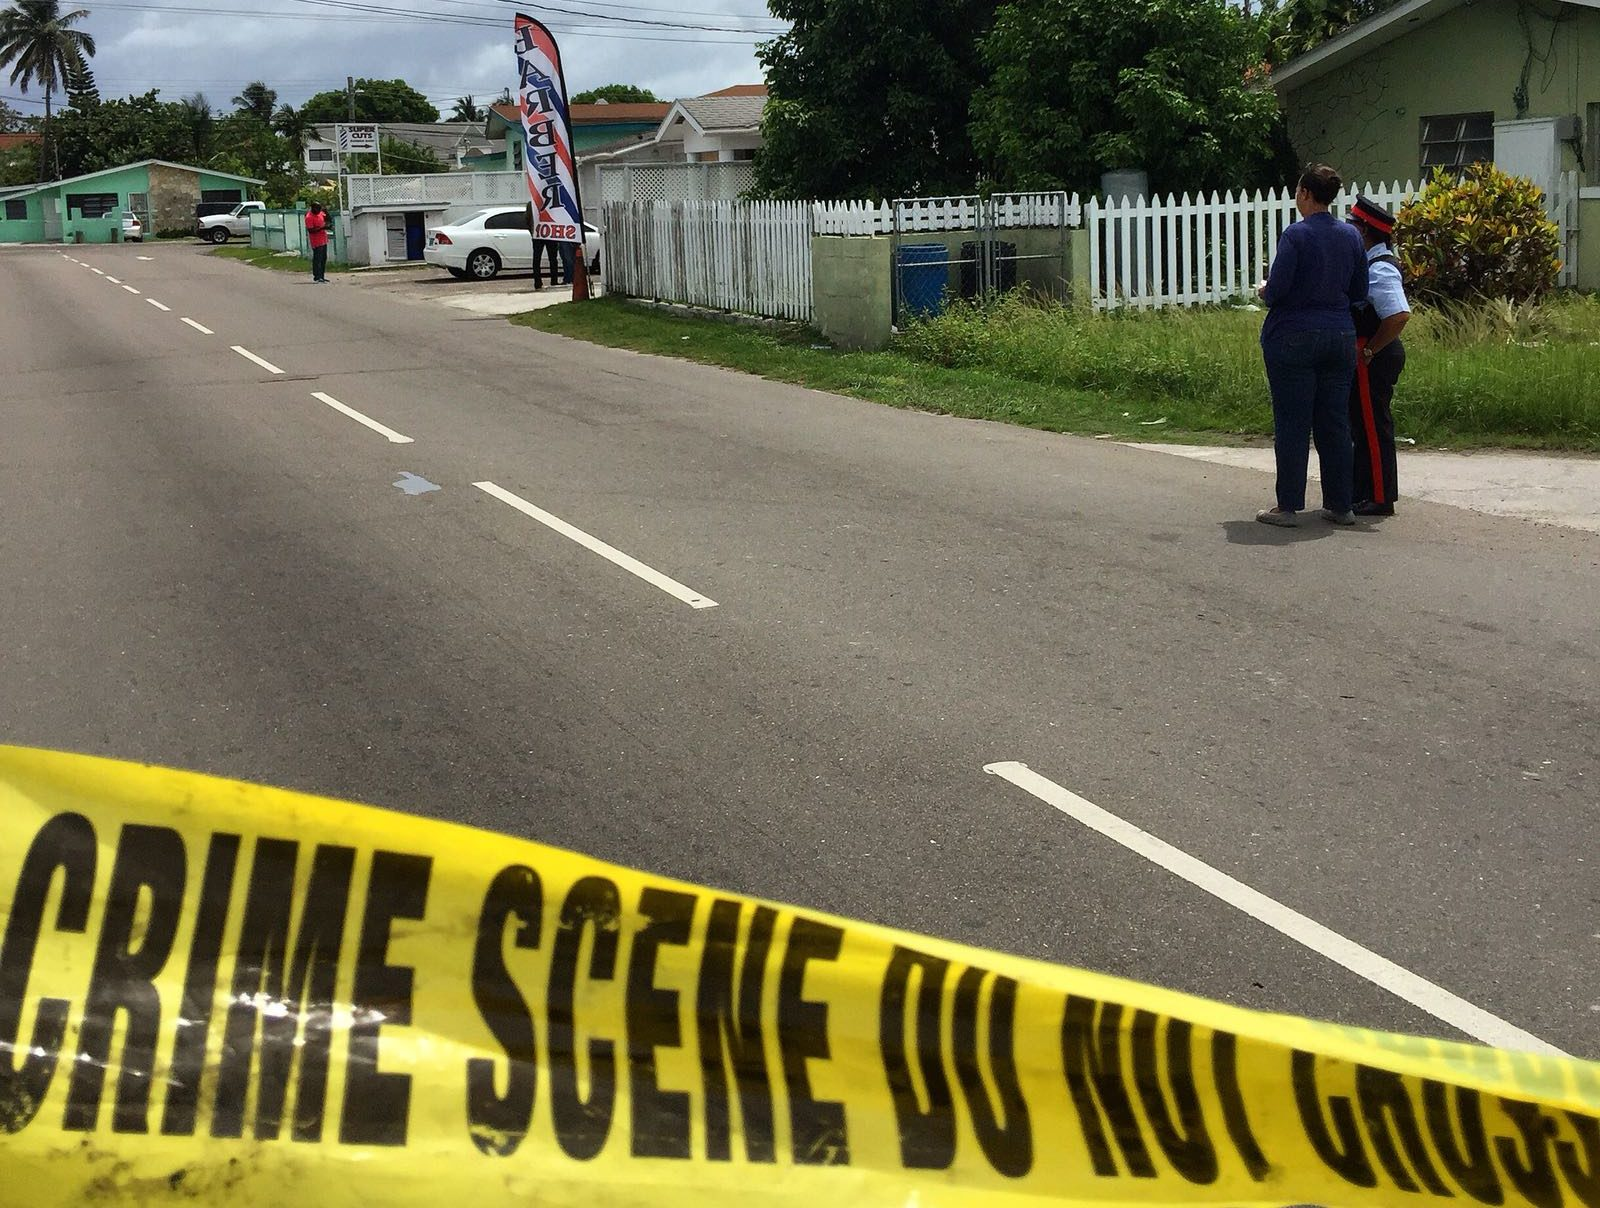 BREAKING: Second shooting victim succumbs to injuries